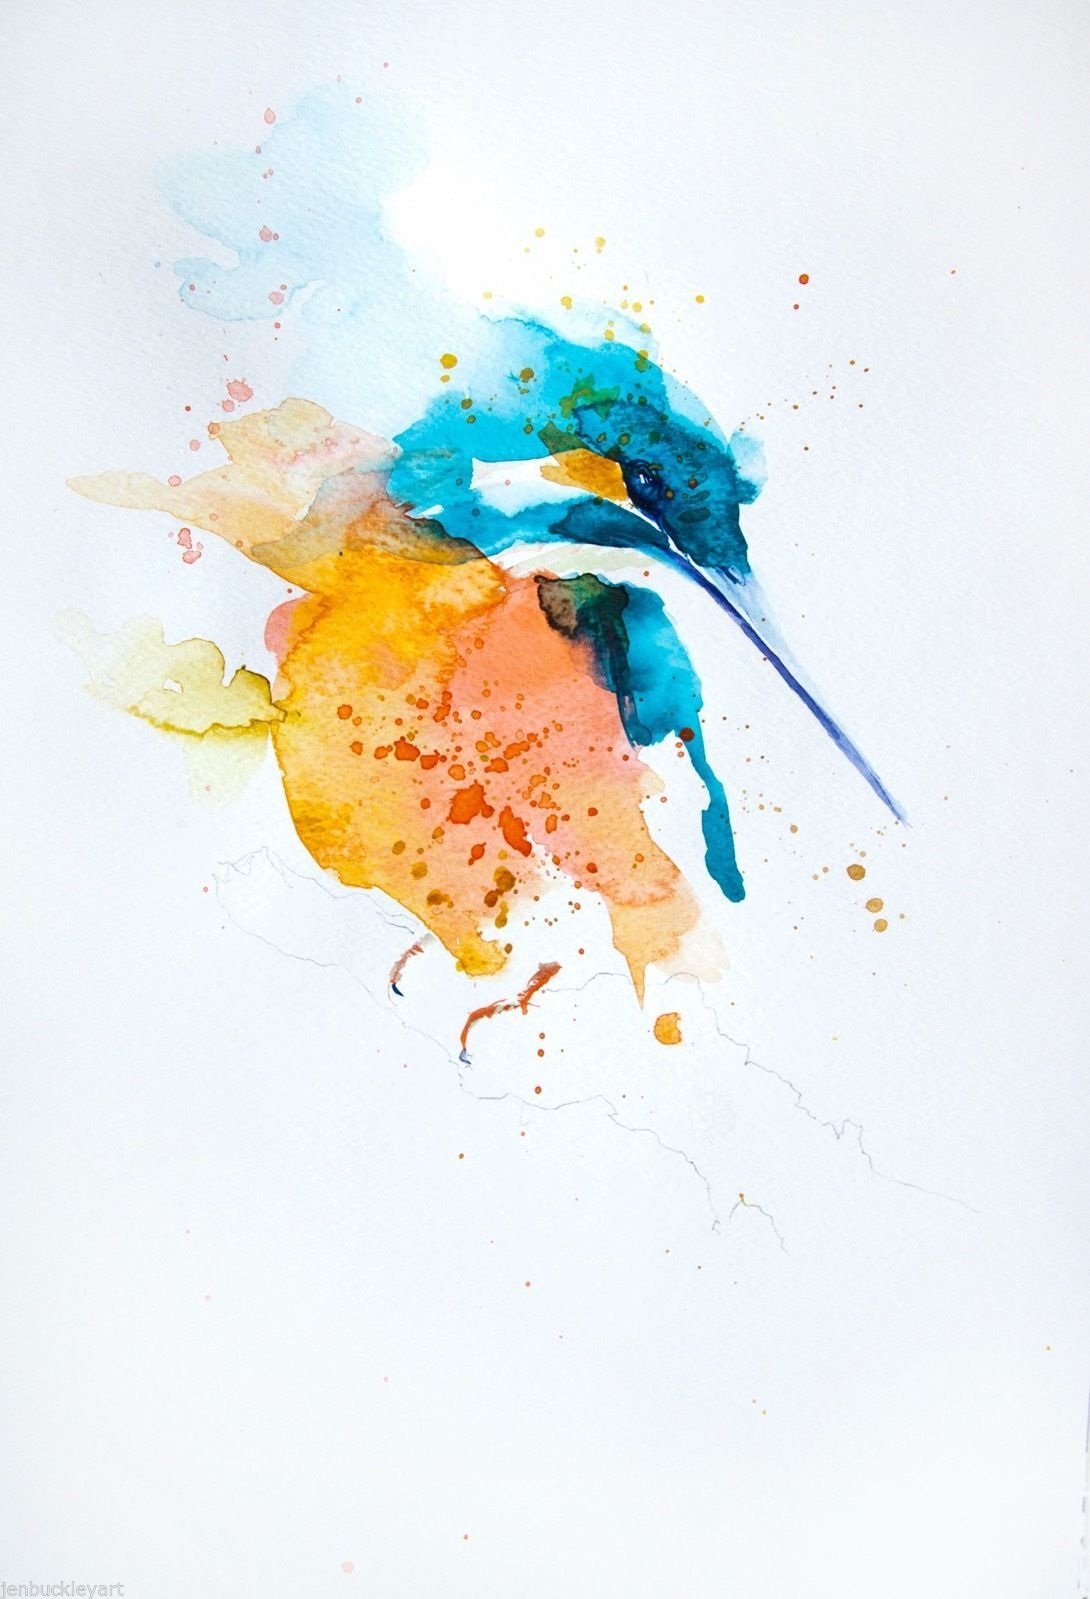 Jen Buckley Kingfisher Watercolor Artists Watercolor Bird